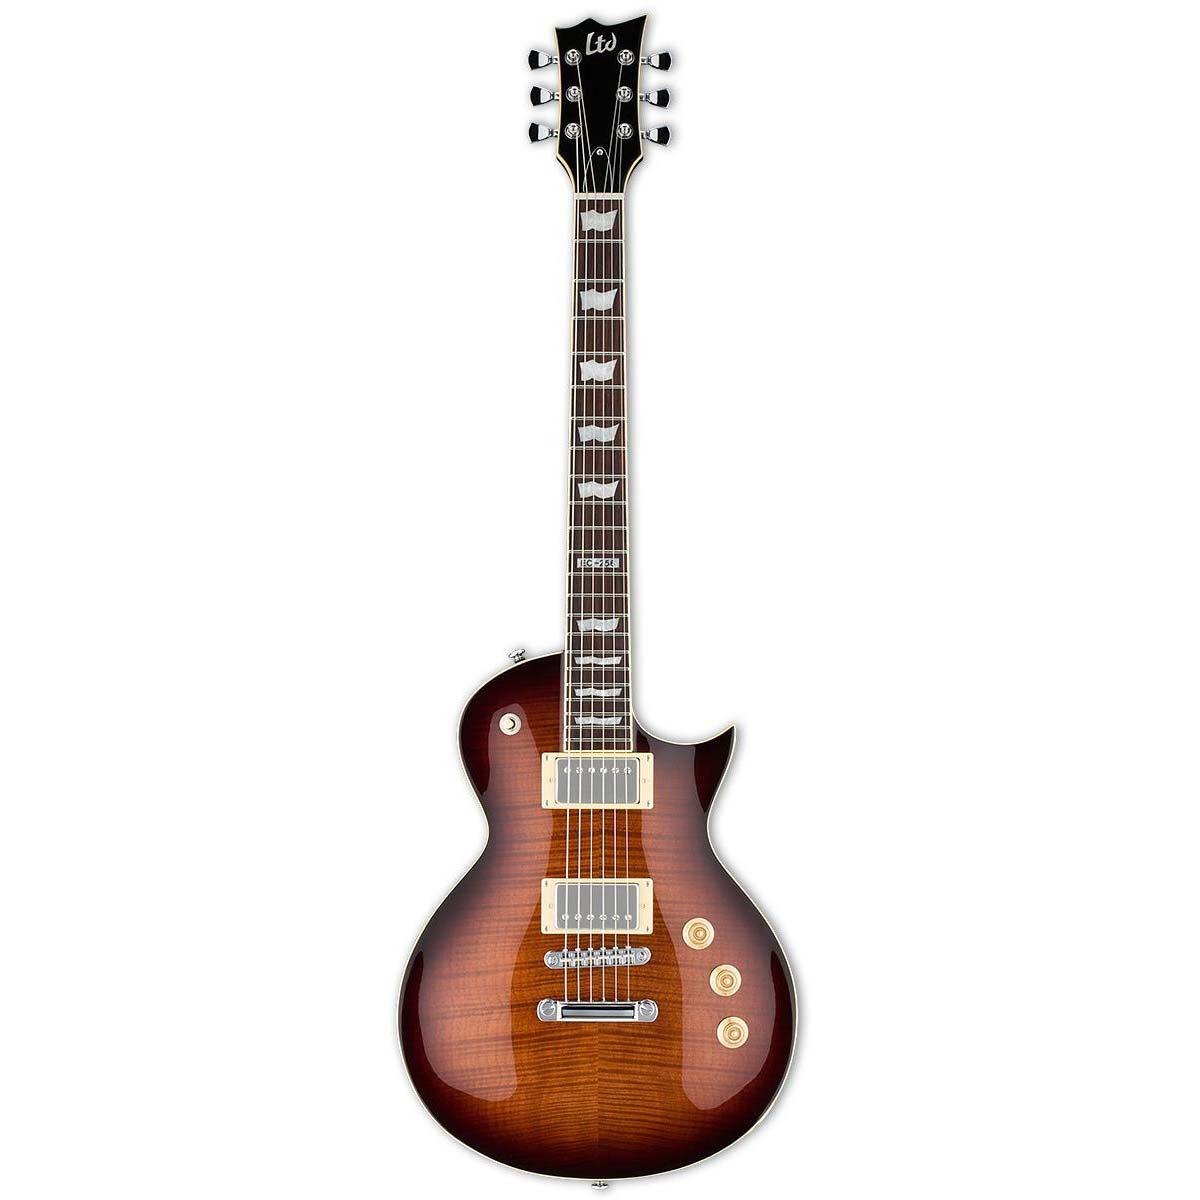 Esp Ltd EC-256FM DBSB el-guitar mørkebrun sunburst